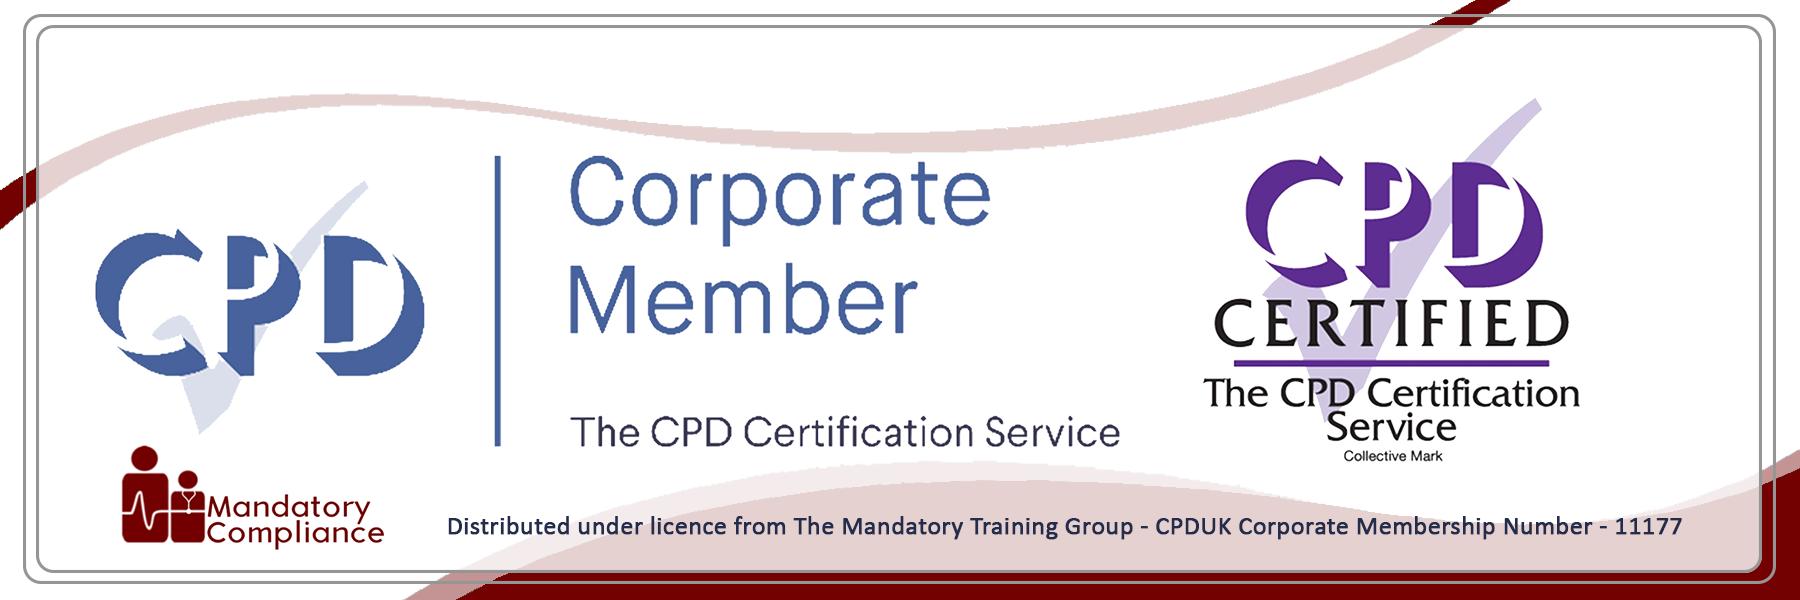 Internet Marketing - Online Learning Courses - E-Learning Courses - Mandatory Compliance UK---